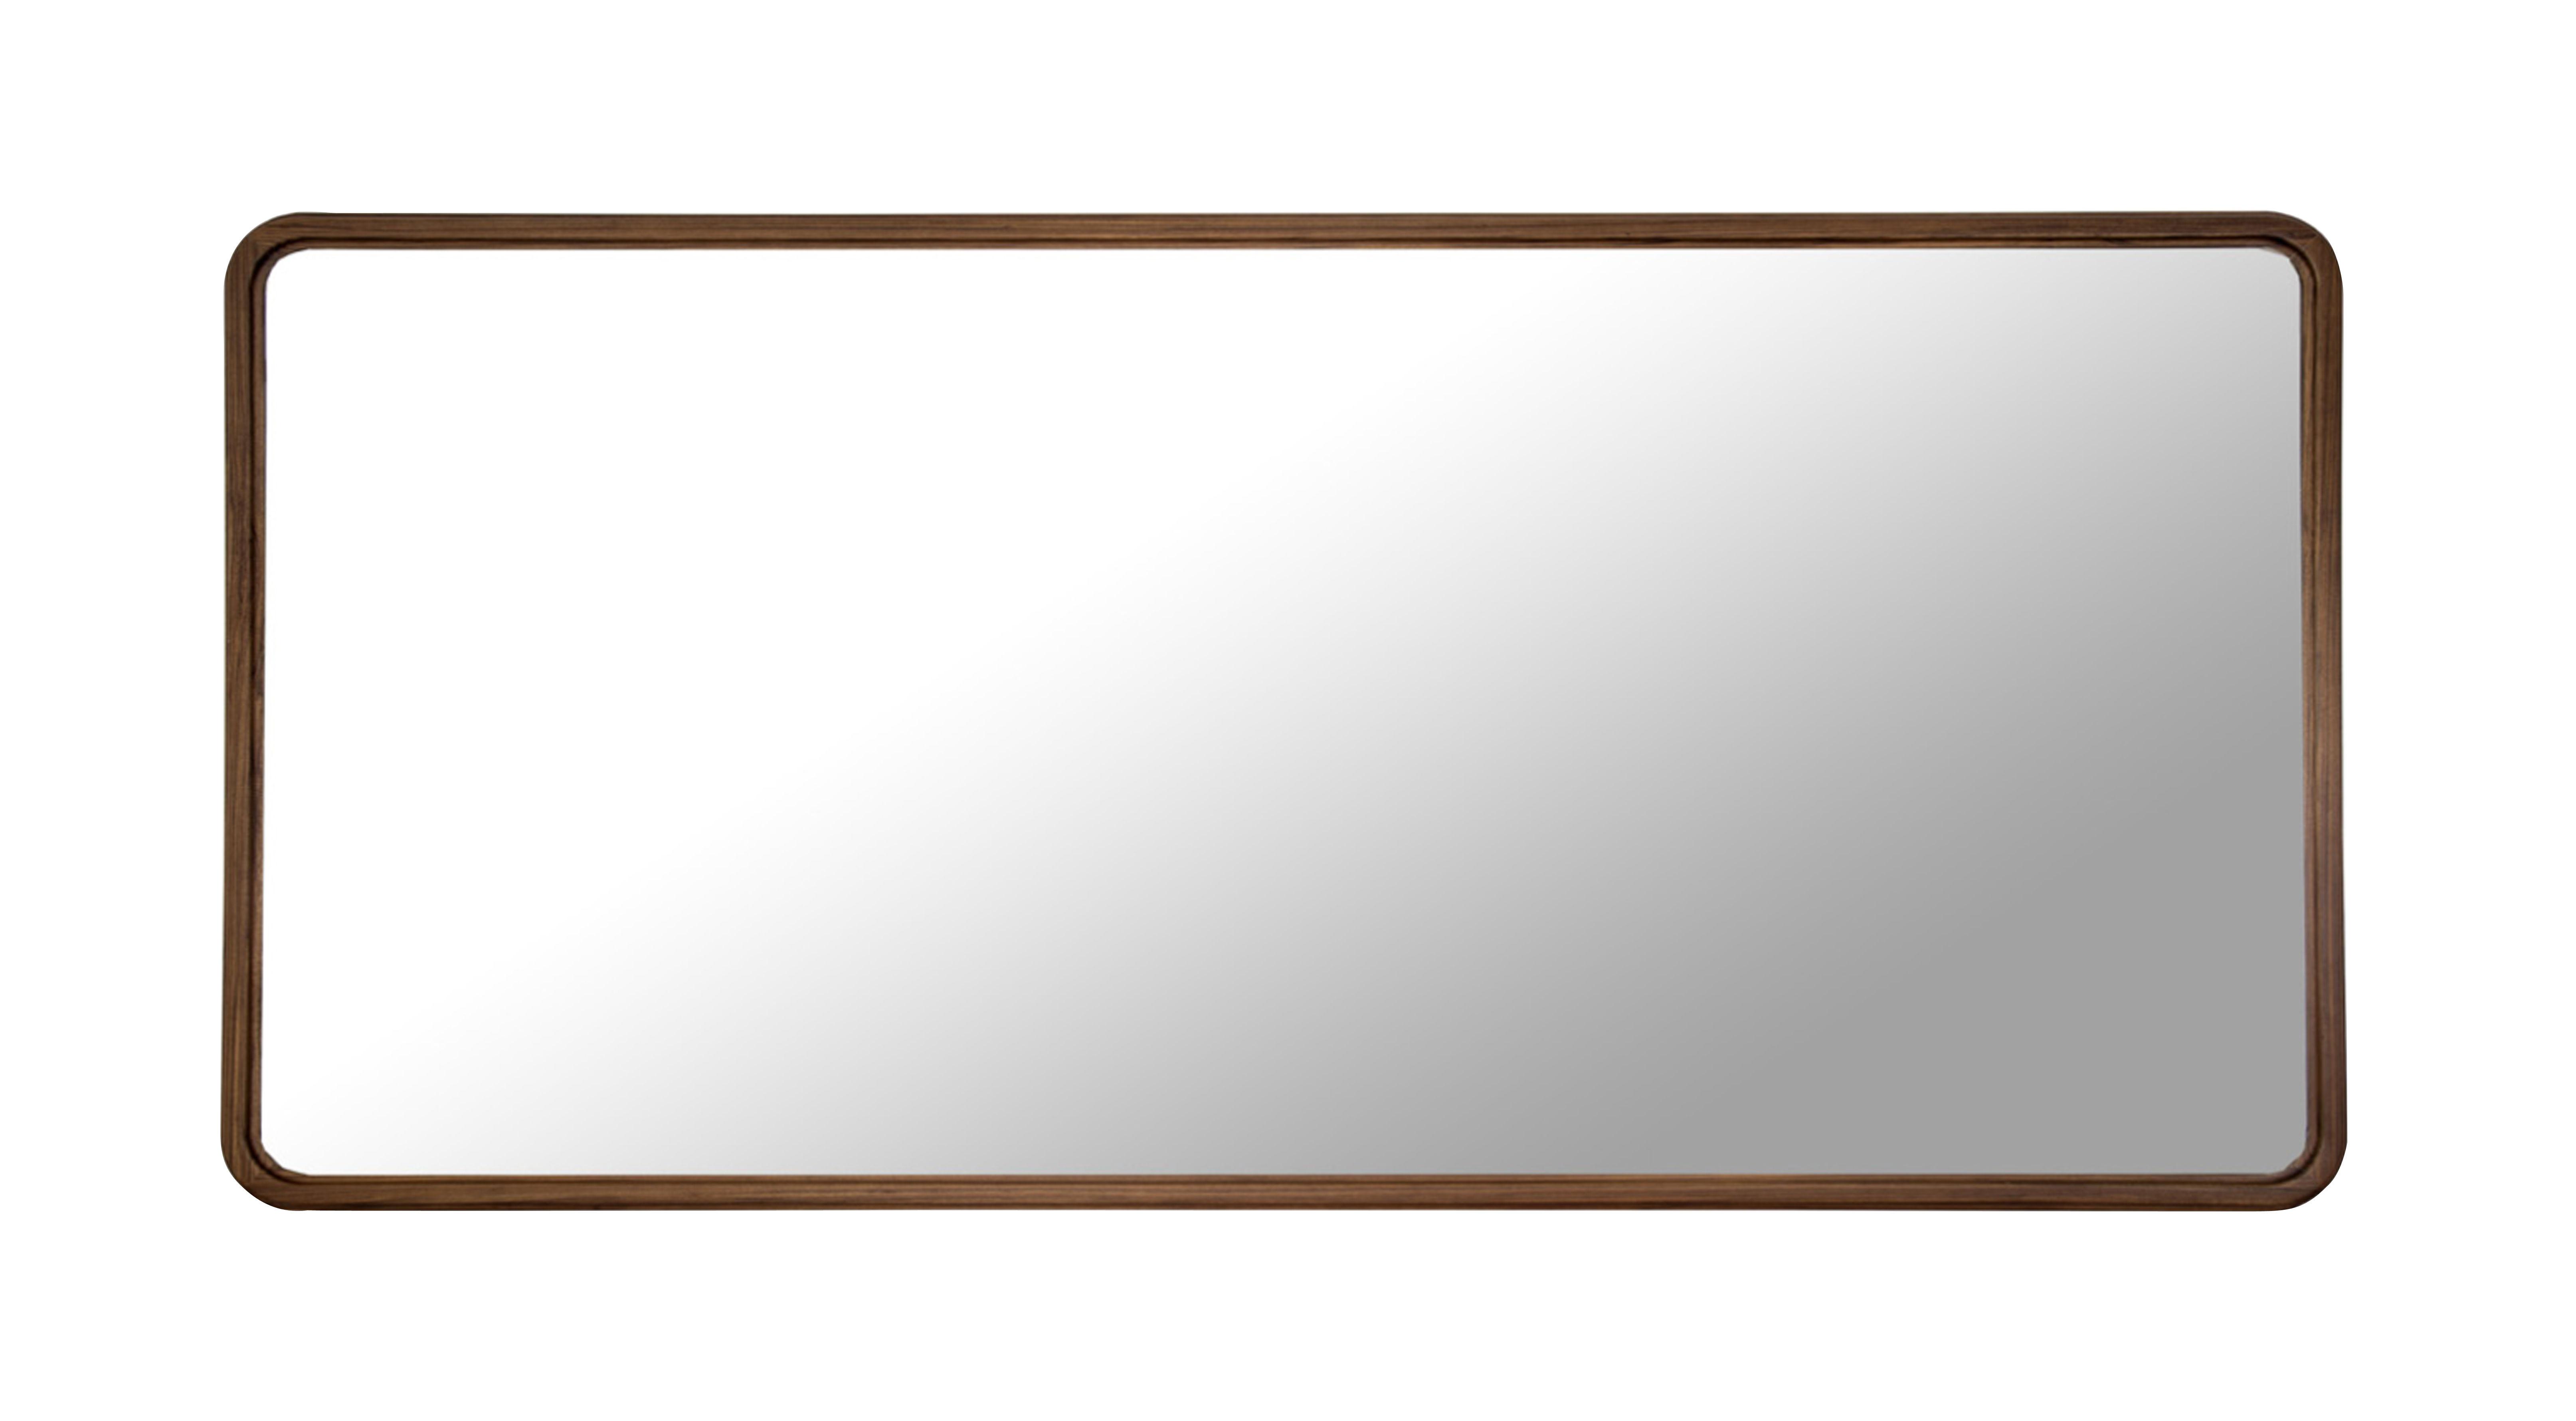 Haussmann wall mirror walnut 200 x 100 cm walnut by for Miroir 200x100